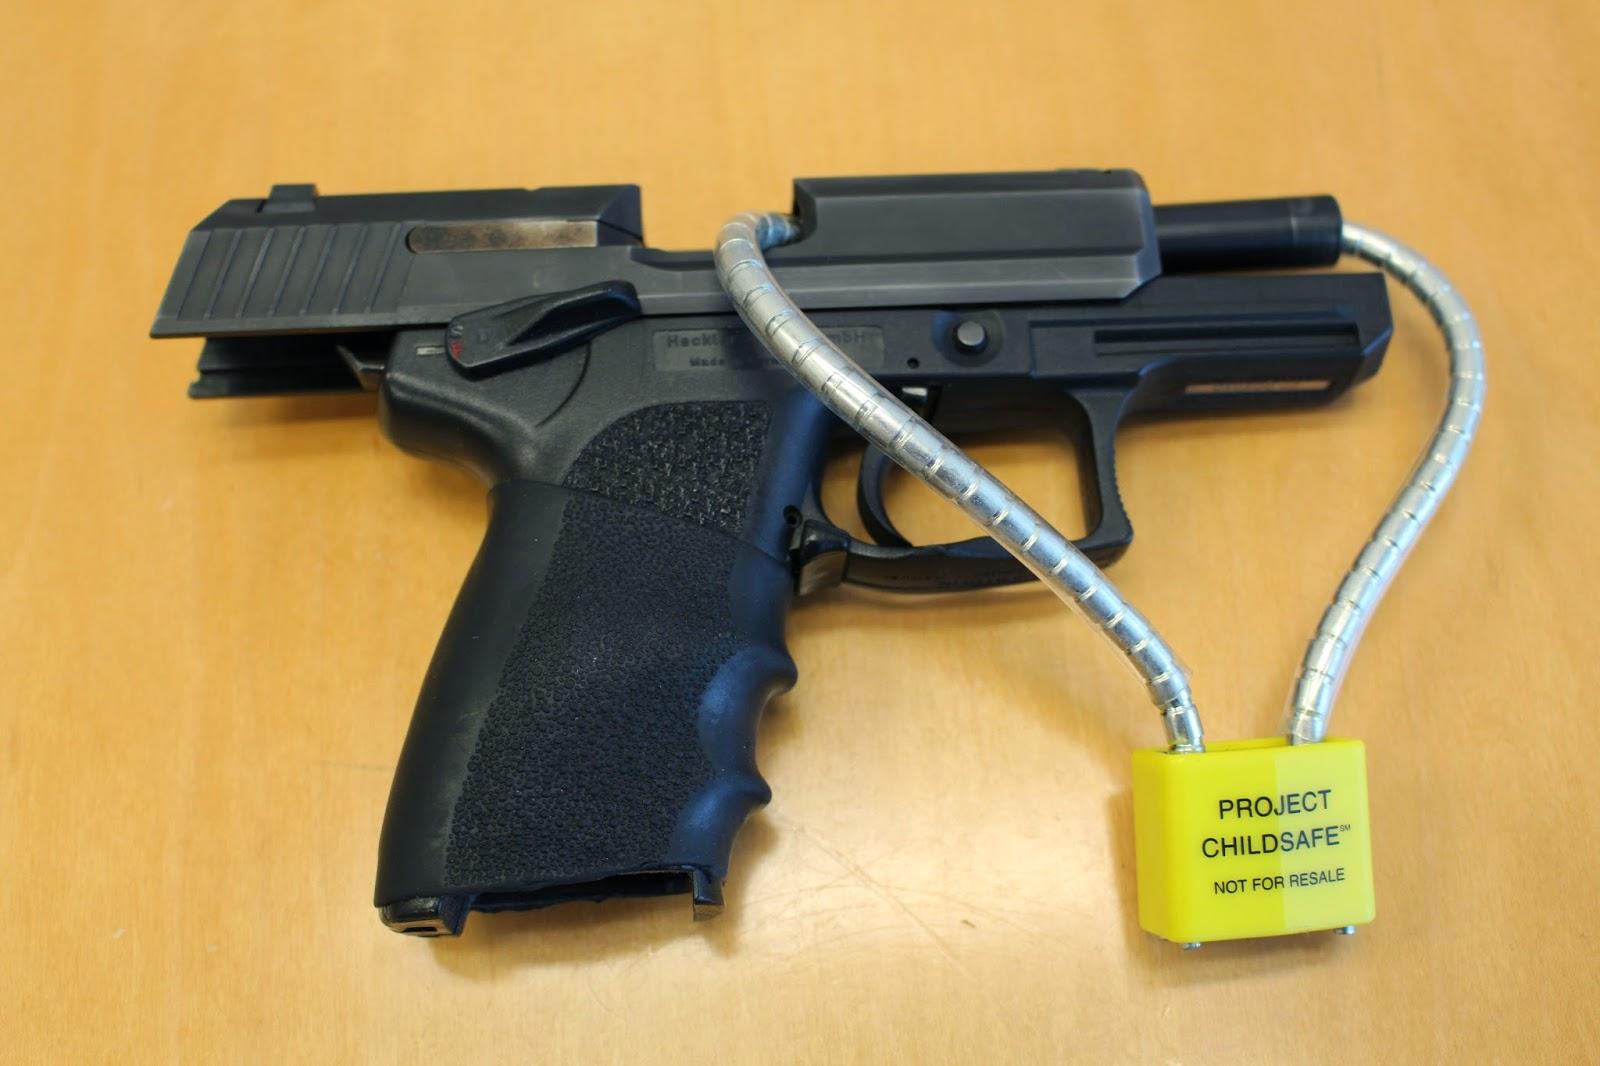 Gun Safety Locks : Santa cruz police free gun locks available at scpd